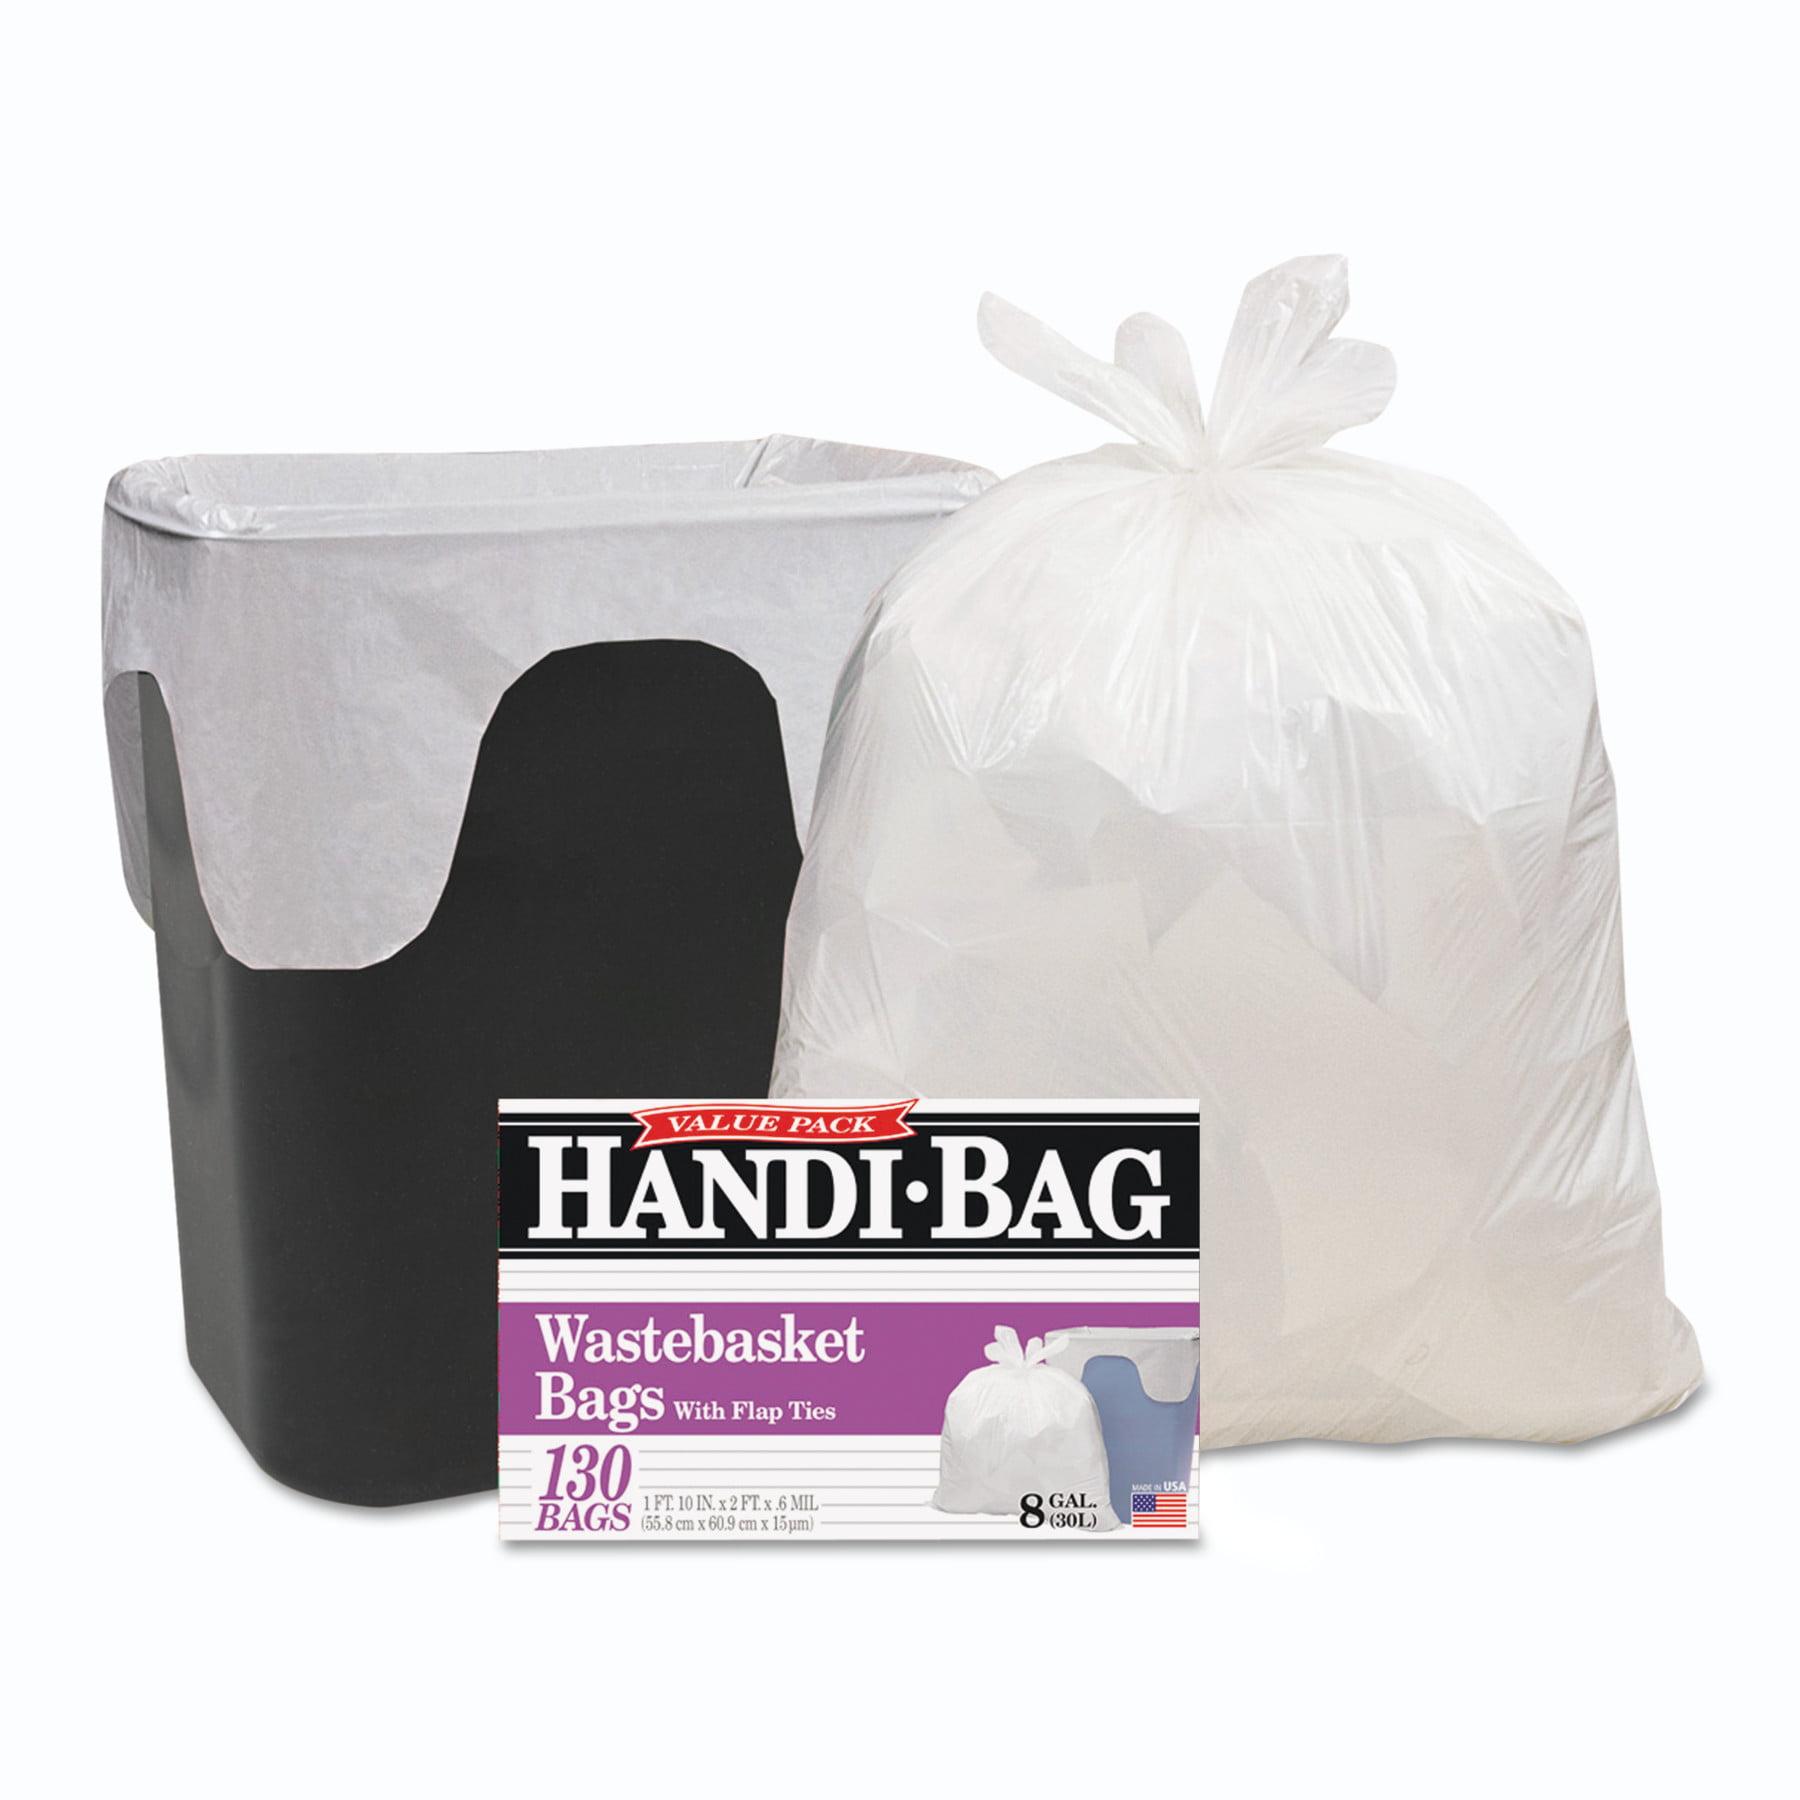 Handi-Bag Handi-Bag Super Value Pack, 8gal, 0.6mil, 22 x 24, White, 130/Box, 6 Box/Carton